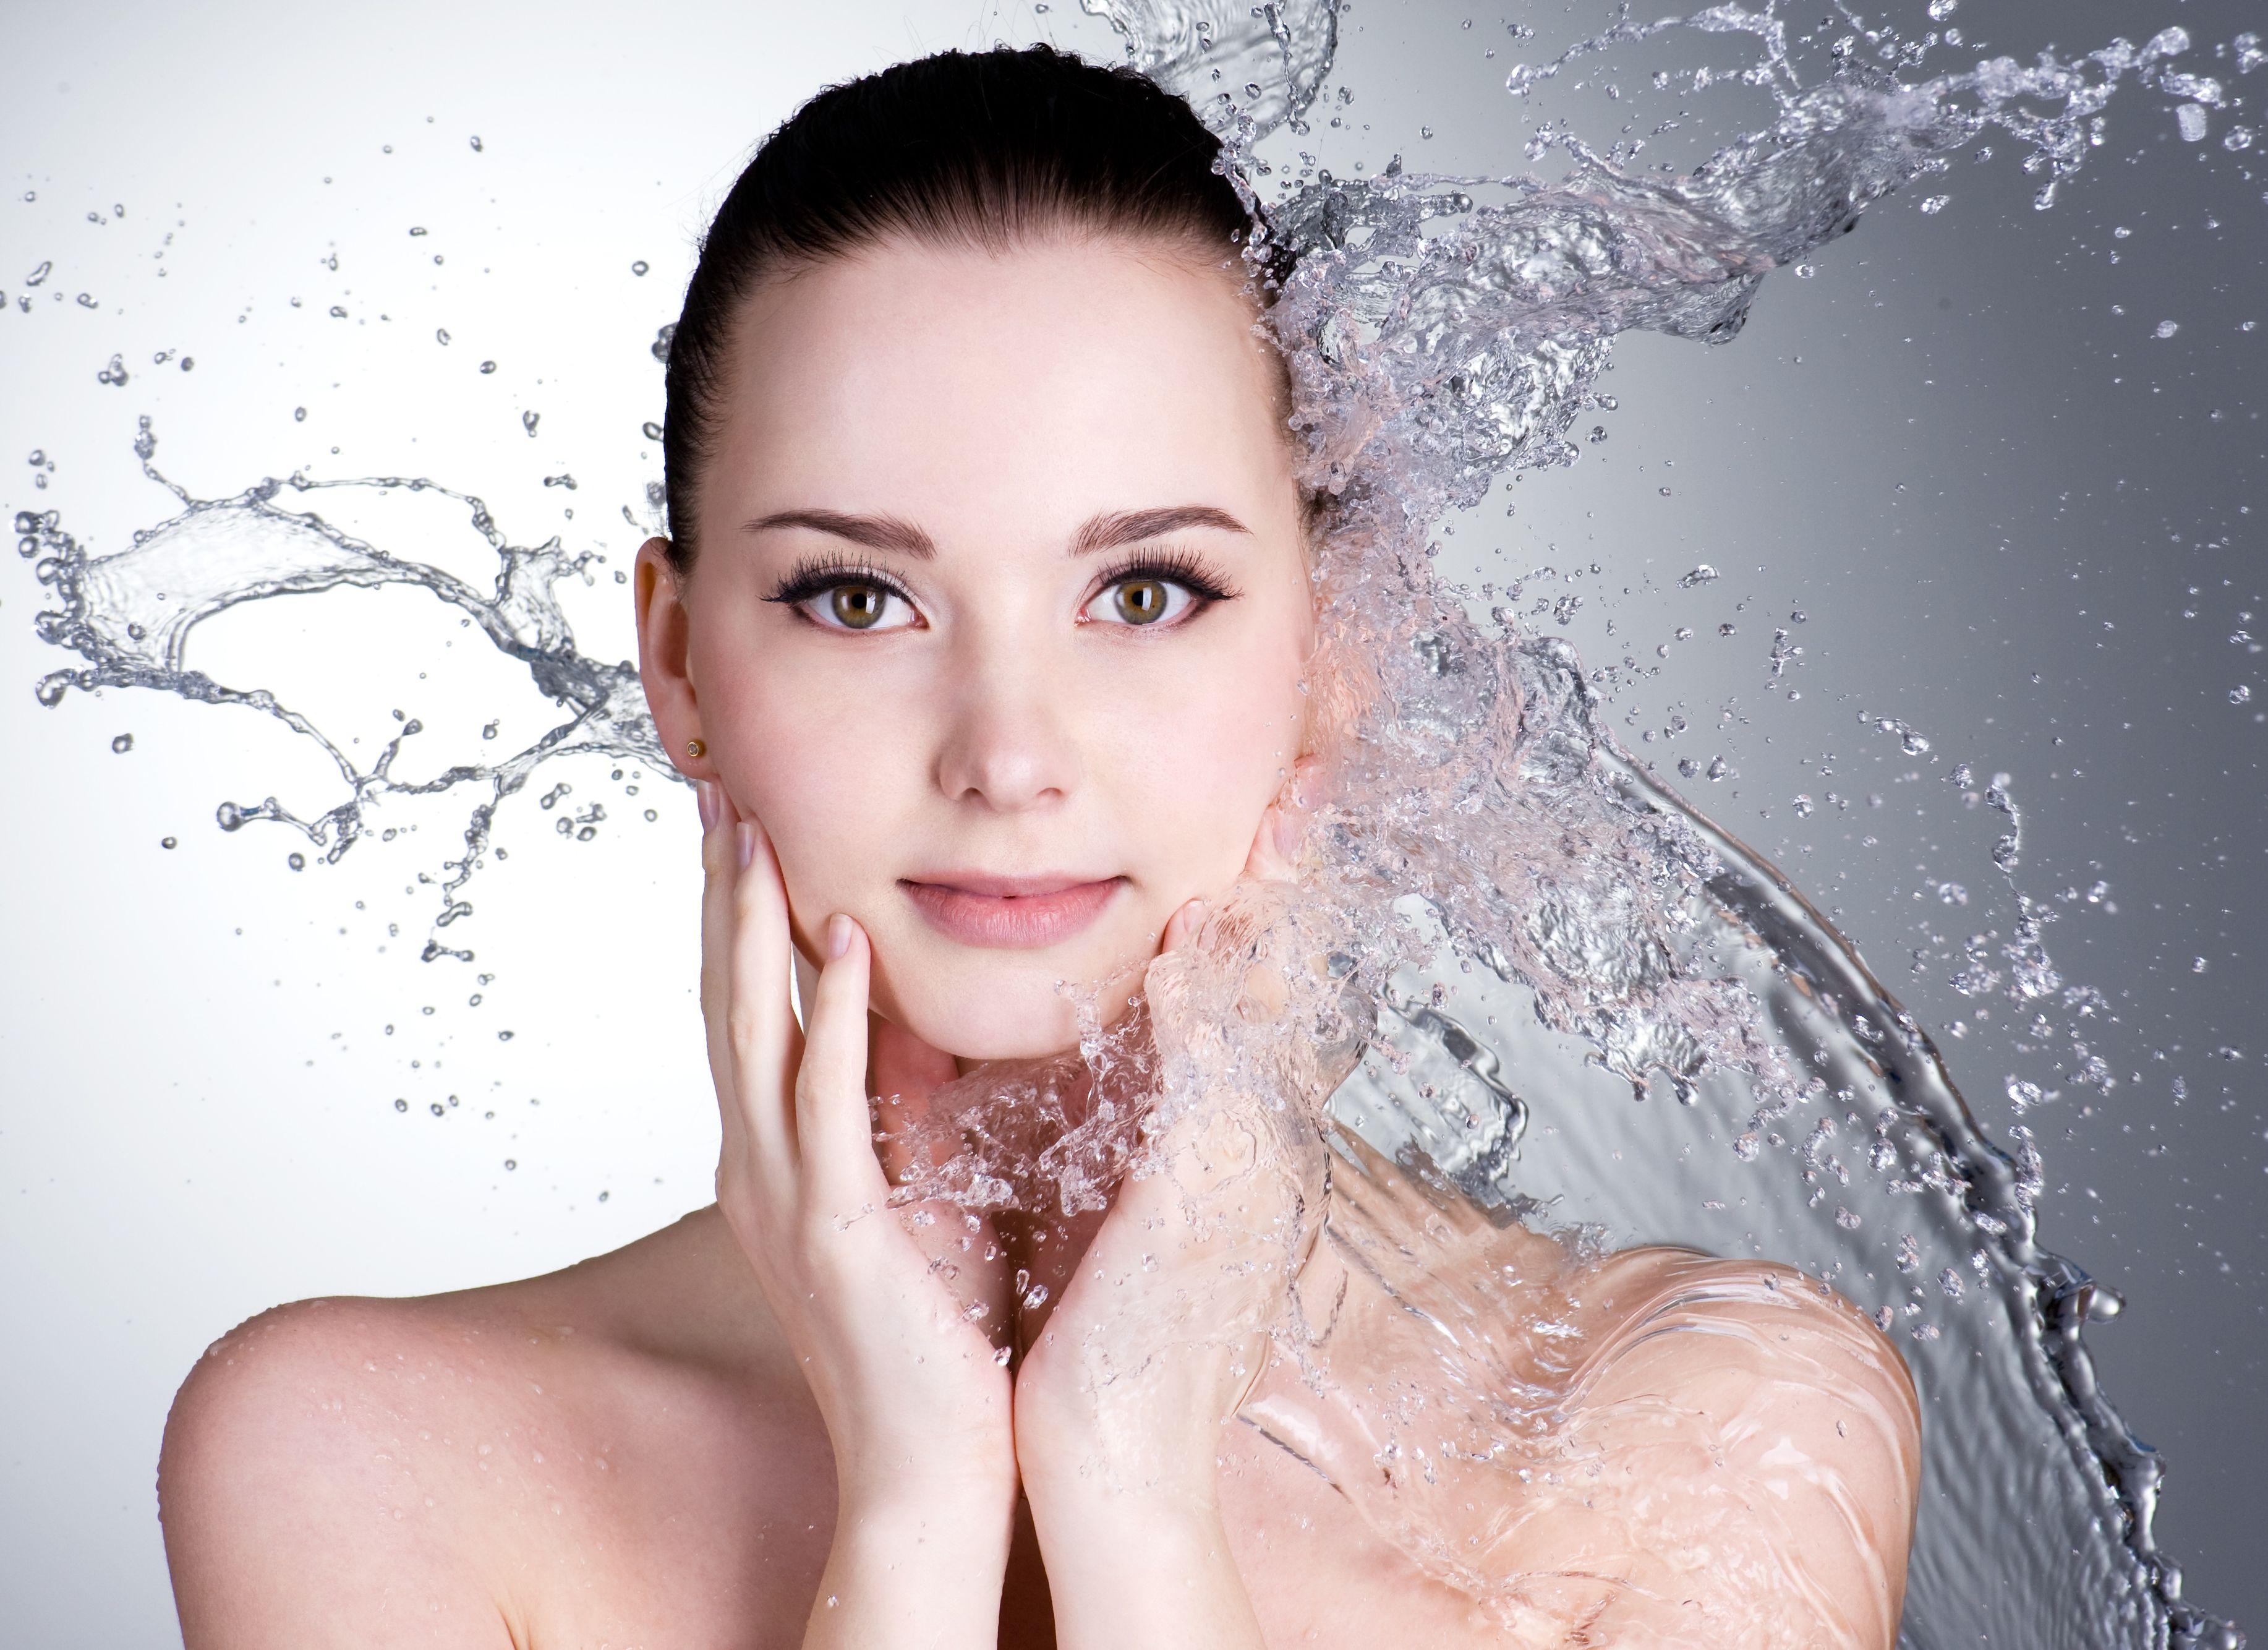 girl-washing-face.jpg